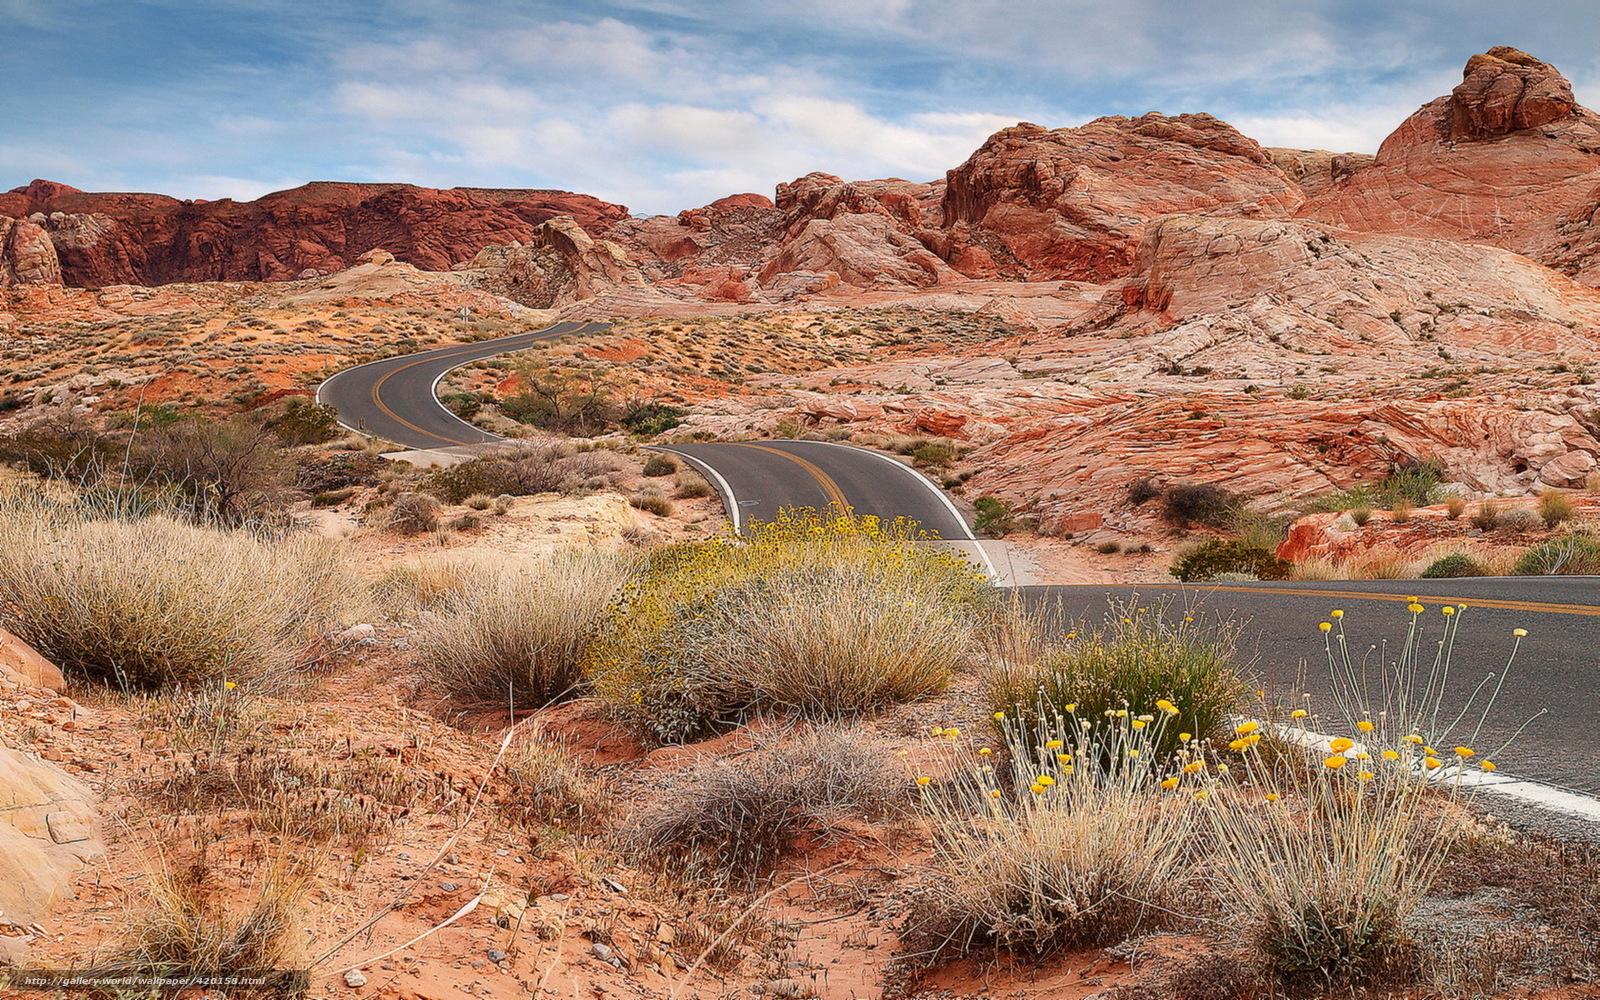 Scenic Highways Download Wallpaper Road Rocks Arizona Landscape Free